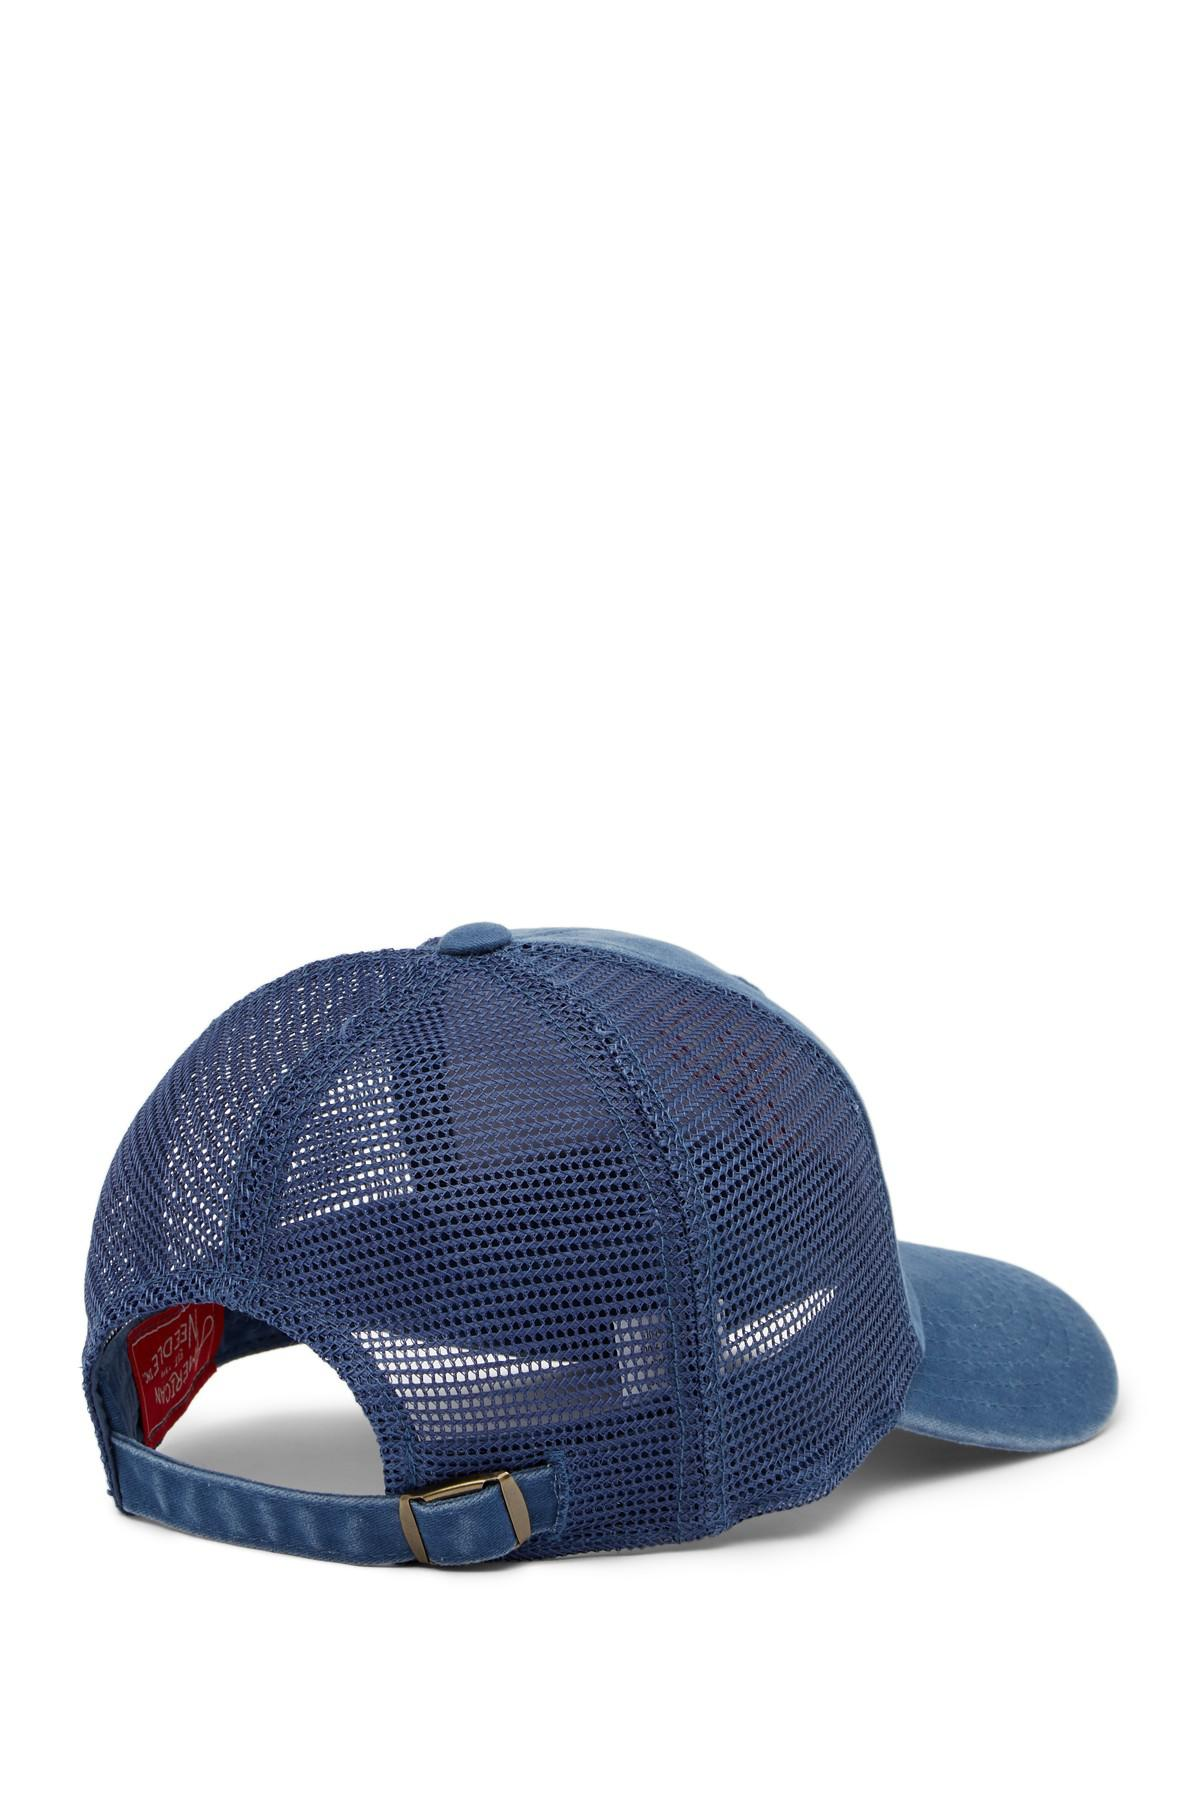 83fdab2894a3d1 American Needle Philadelphia Phillies Raglan Bones Mesh Baseball Cap ...